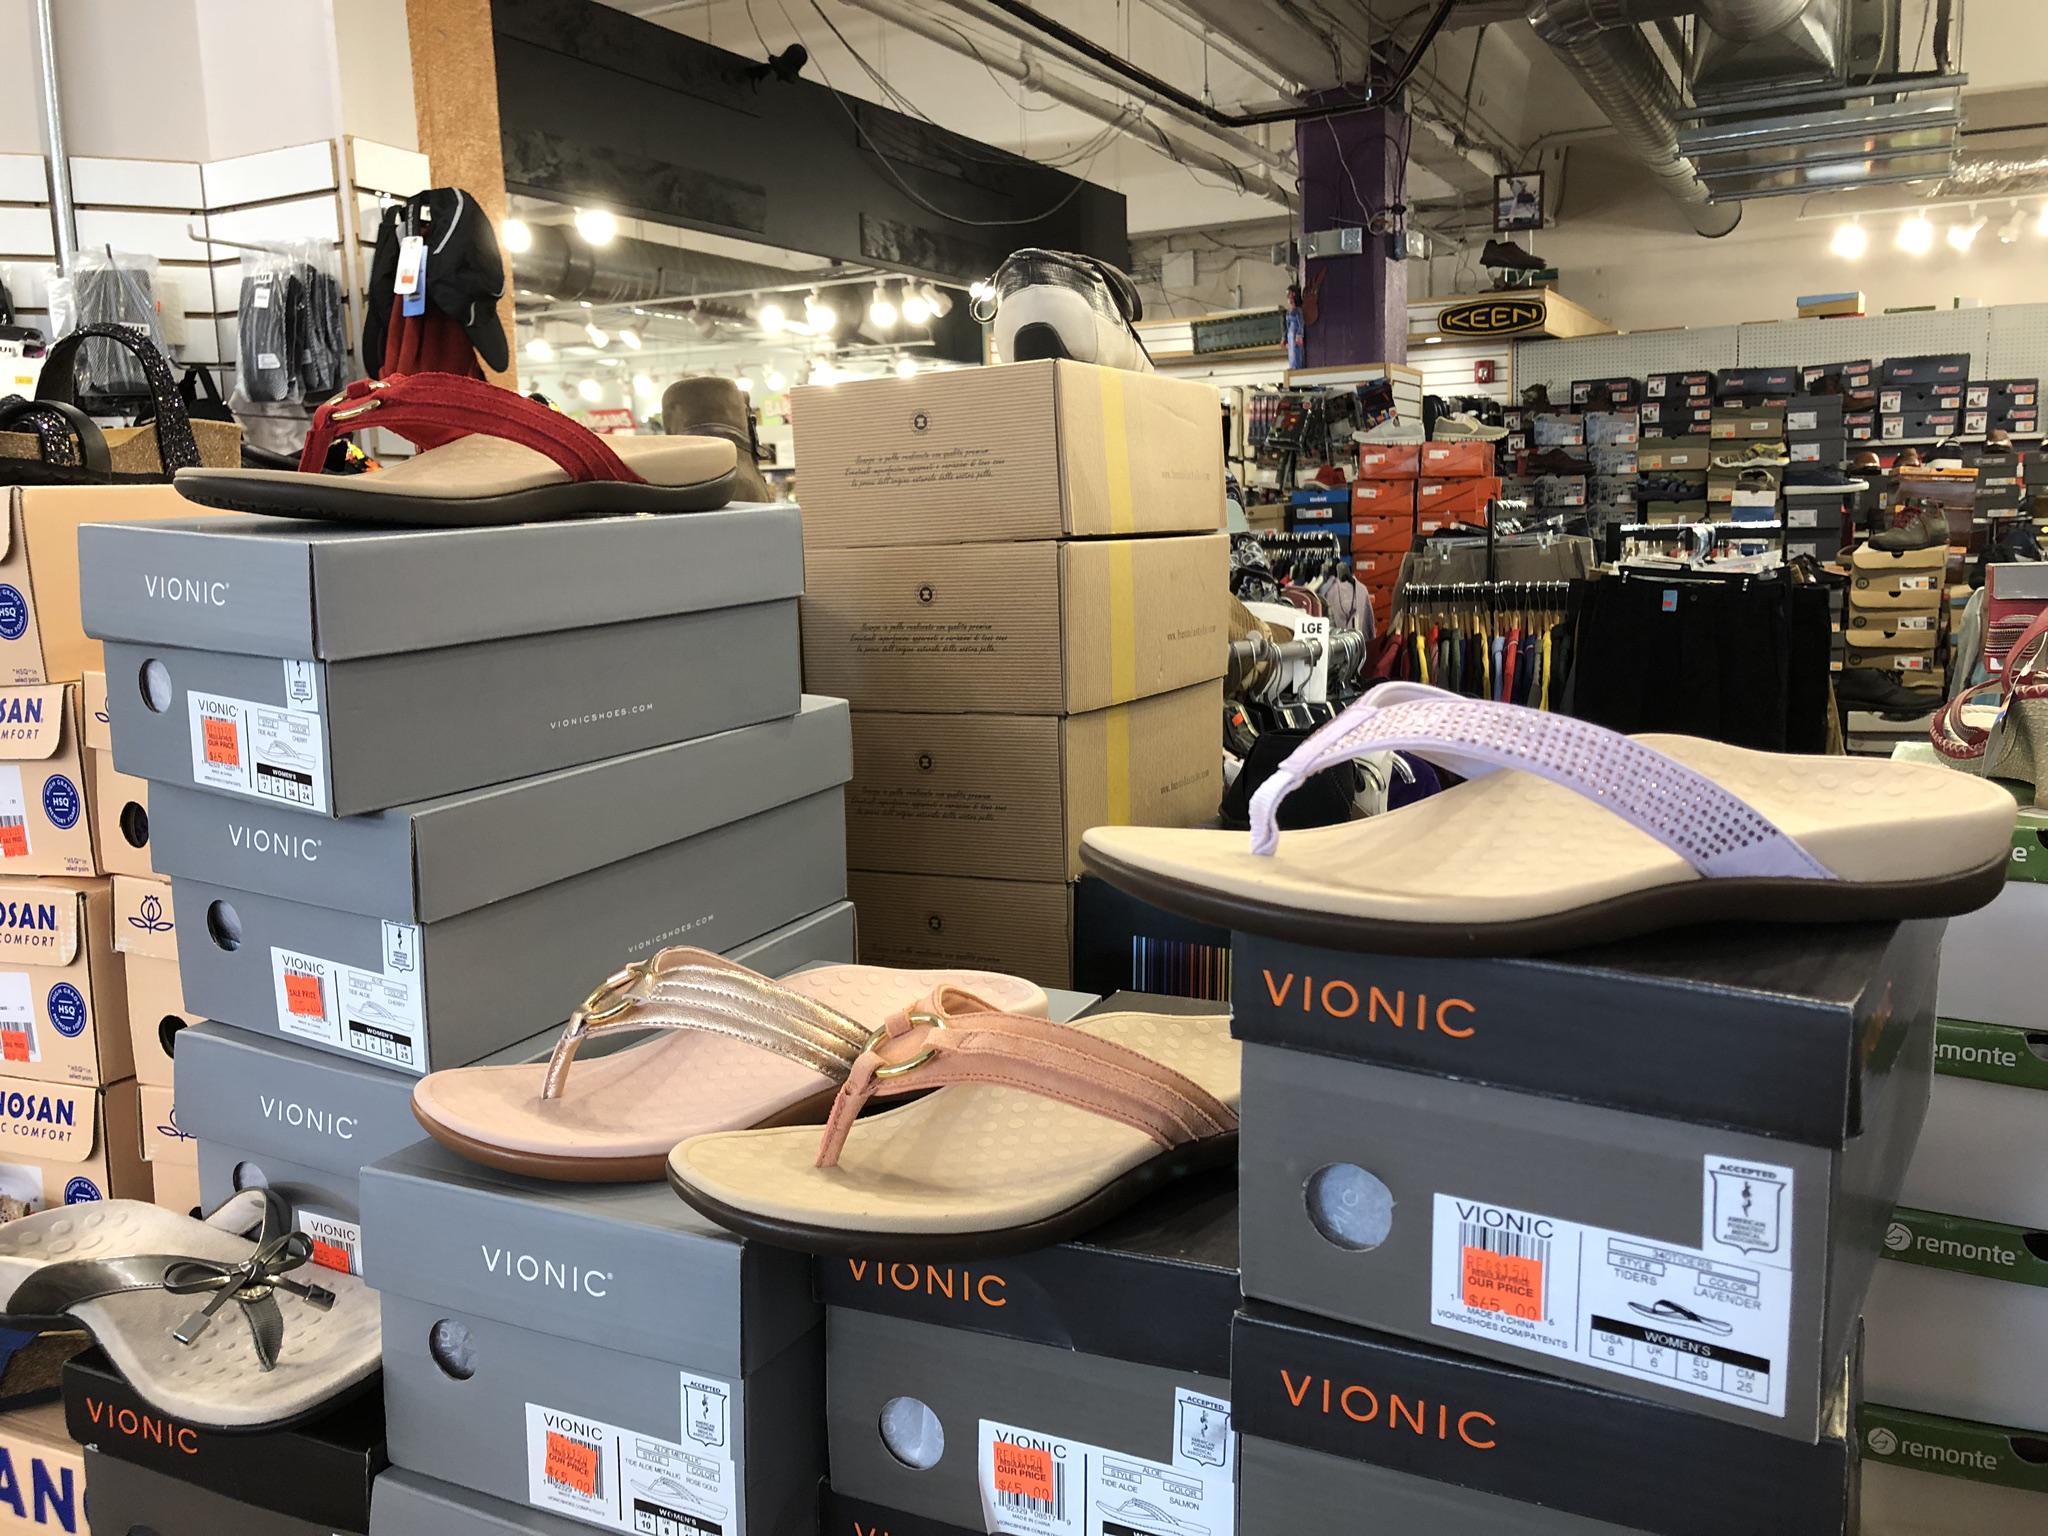 VIONIC Flip Flops - Reg Price $150, Our Price $65